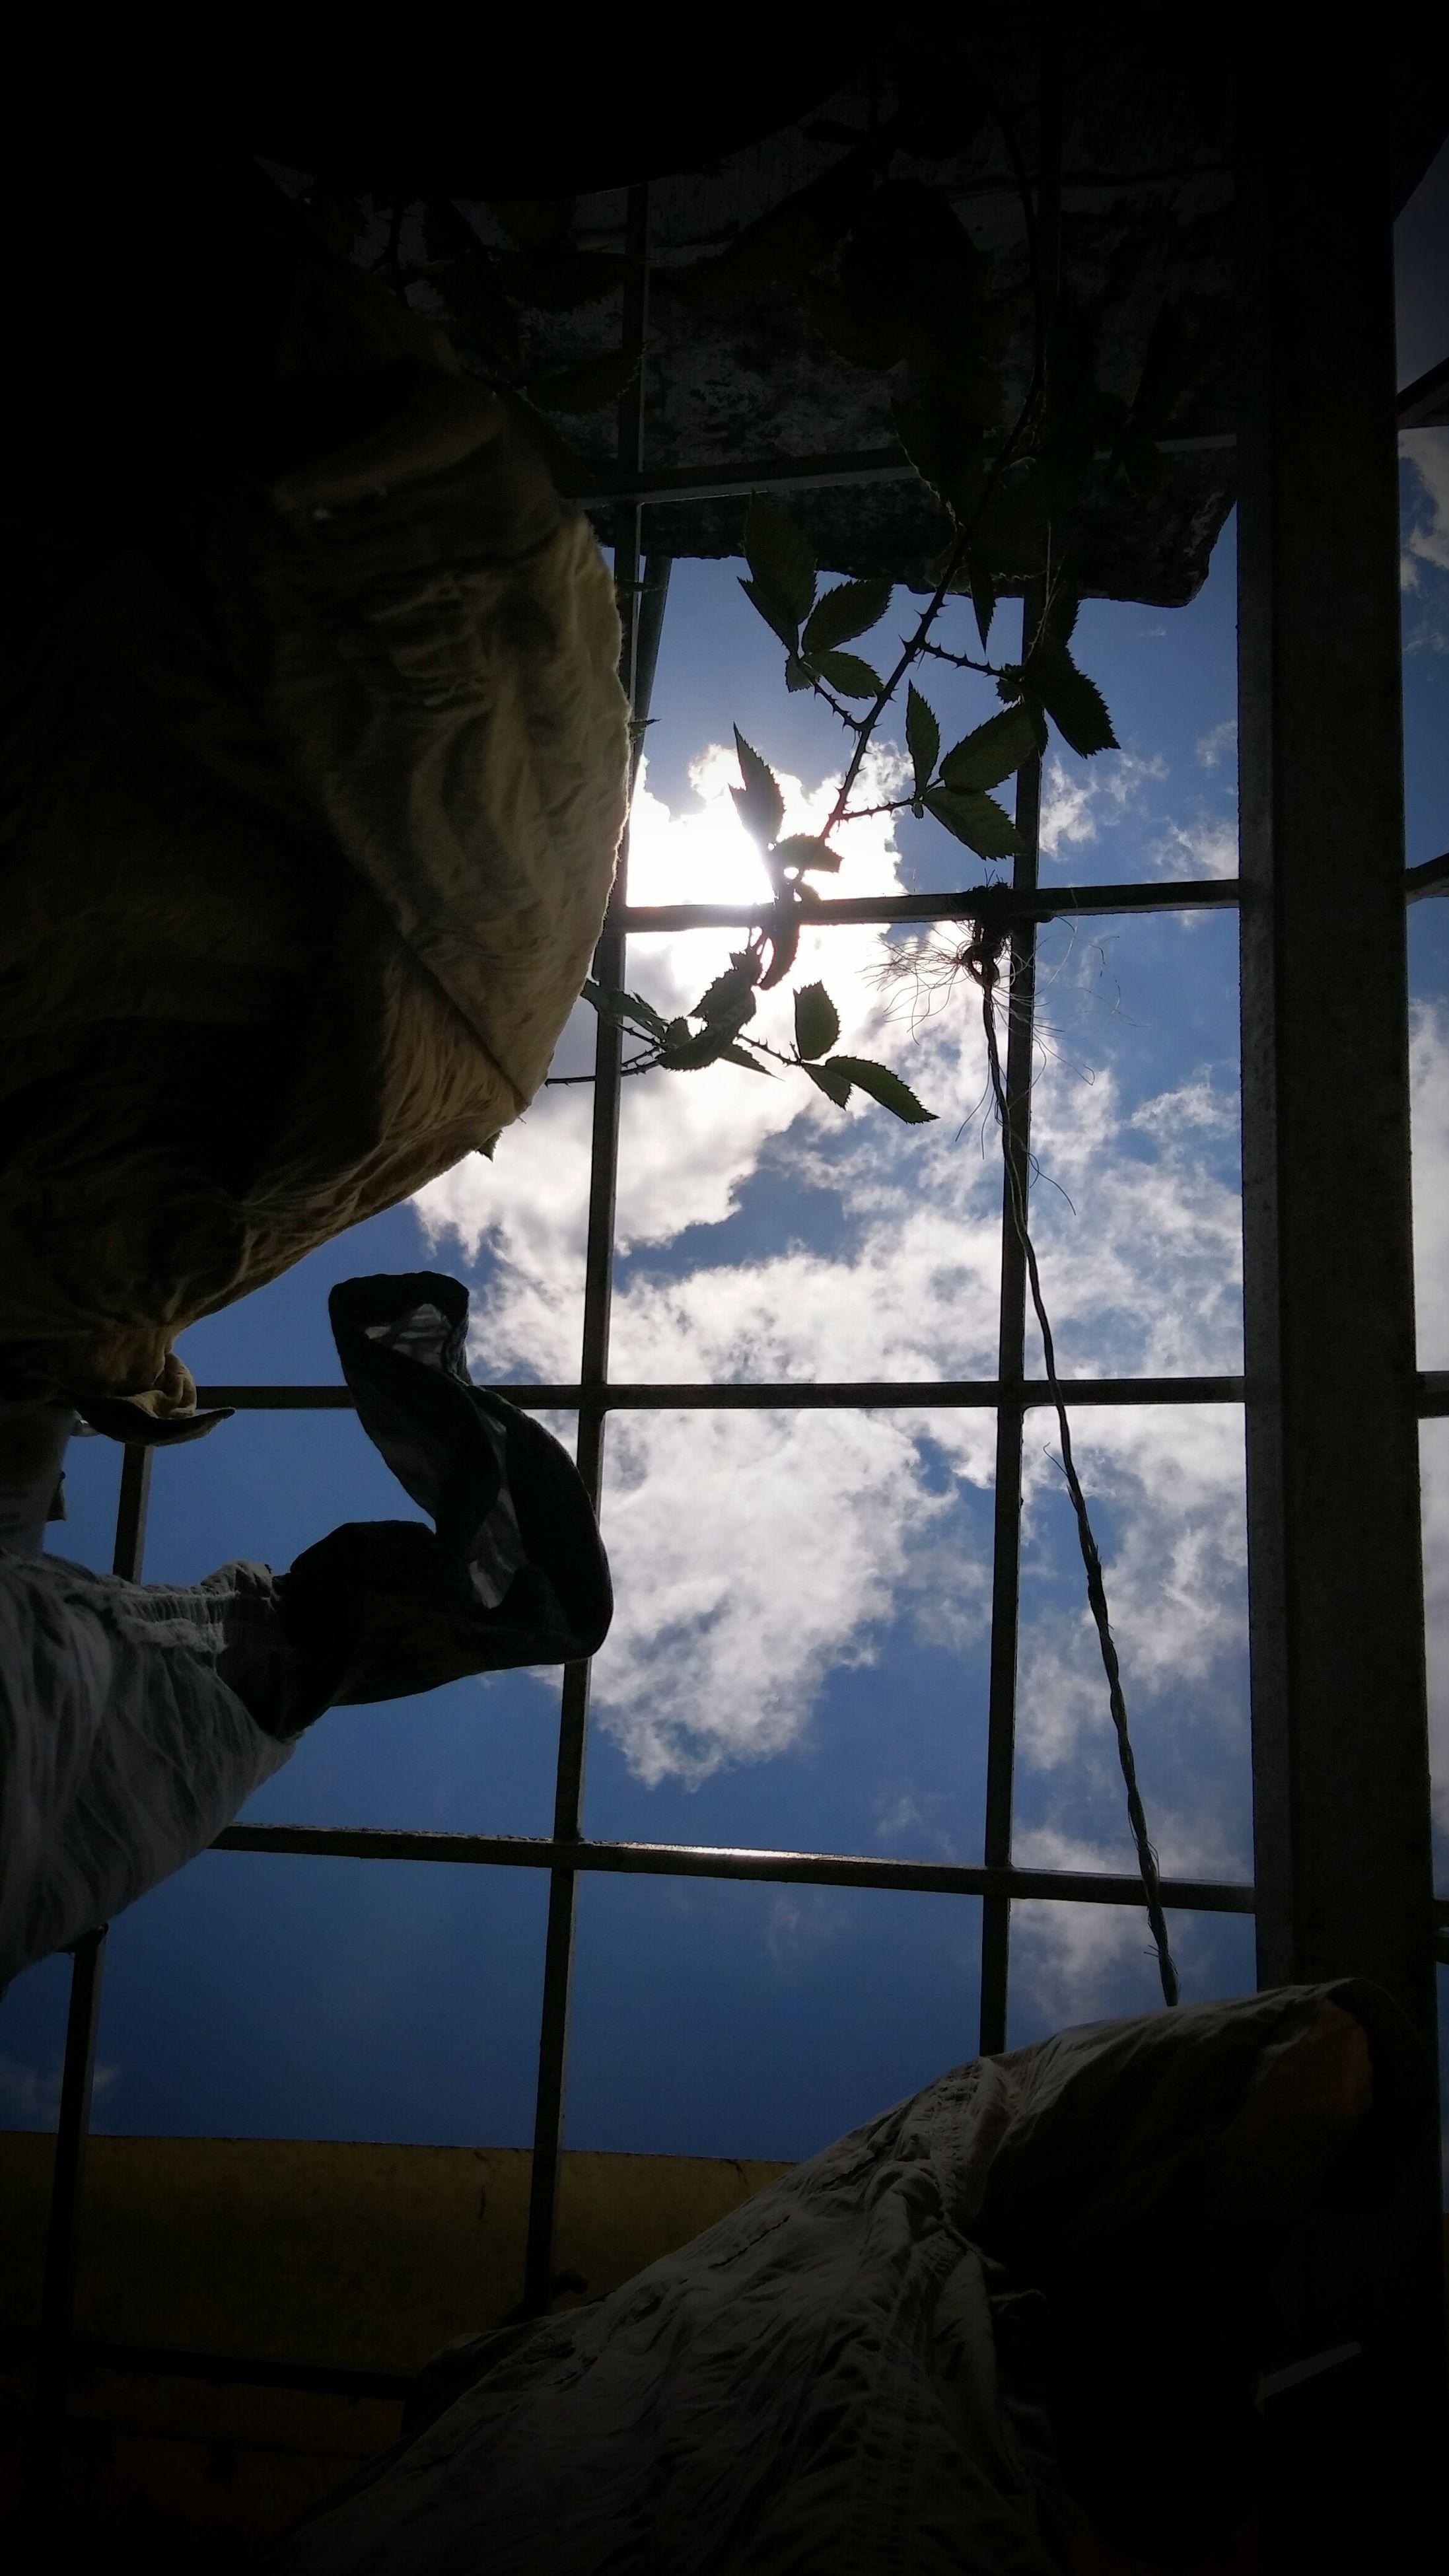 indoors, sky, window, ceiling, cloud - sky, day, nature, scenics